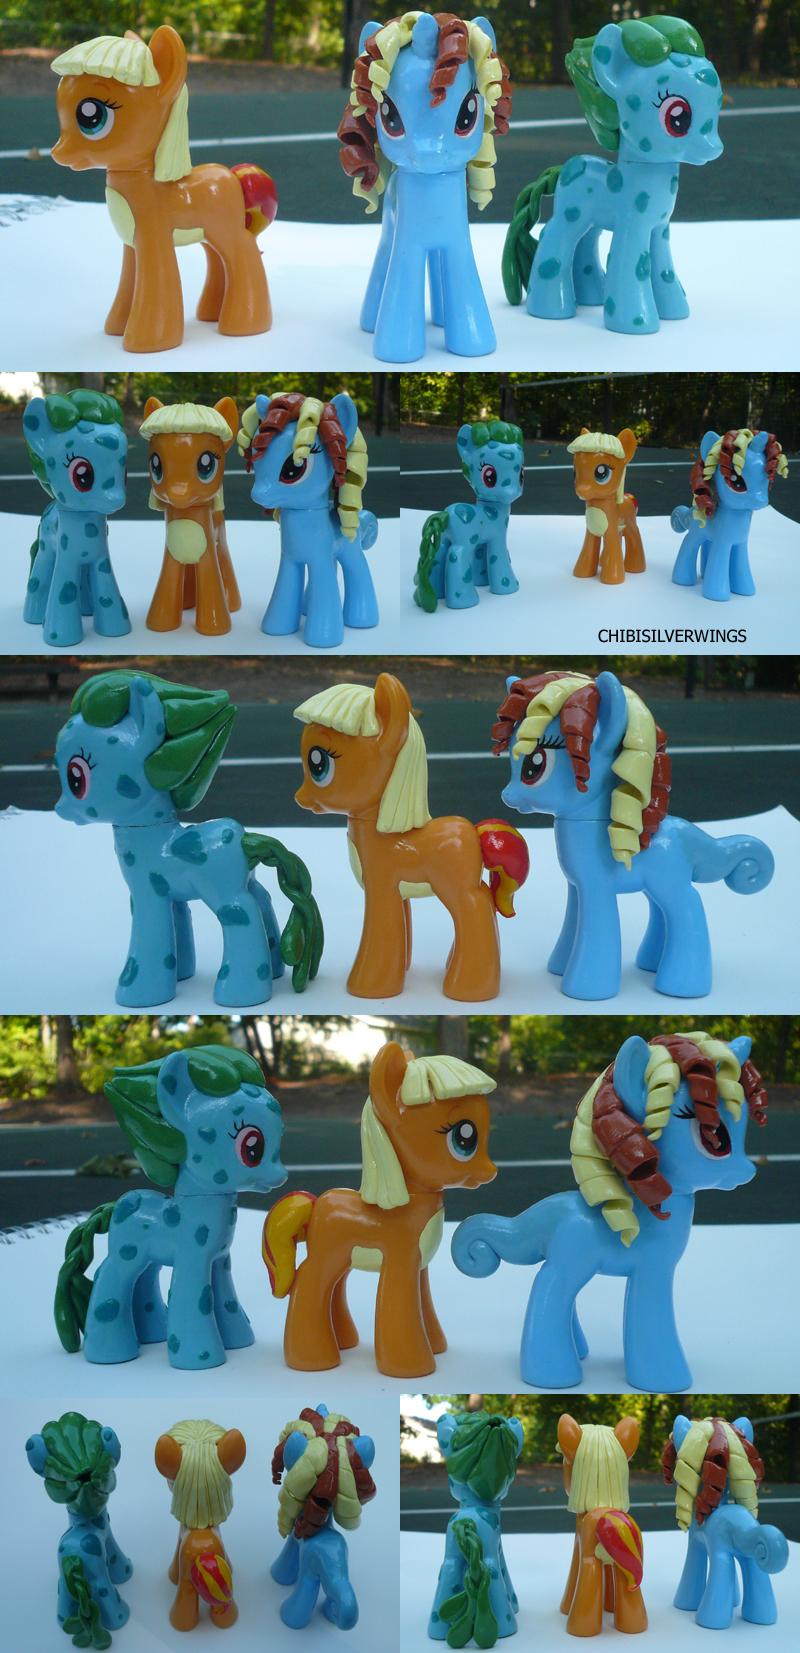 Gen 1 Starter Ponymons by ChibiSilverWings